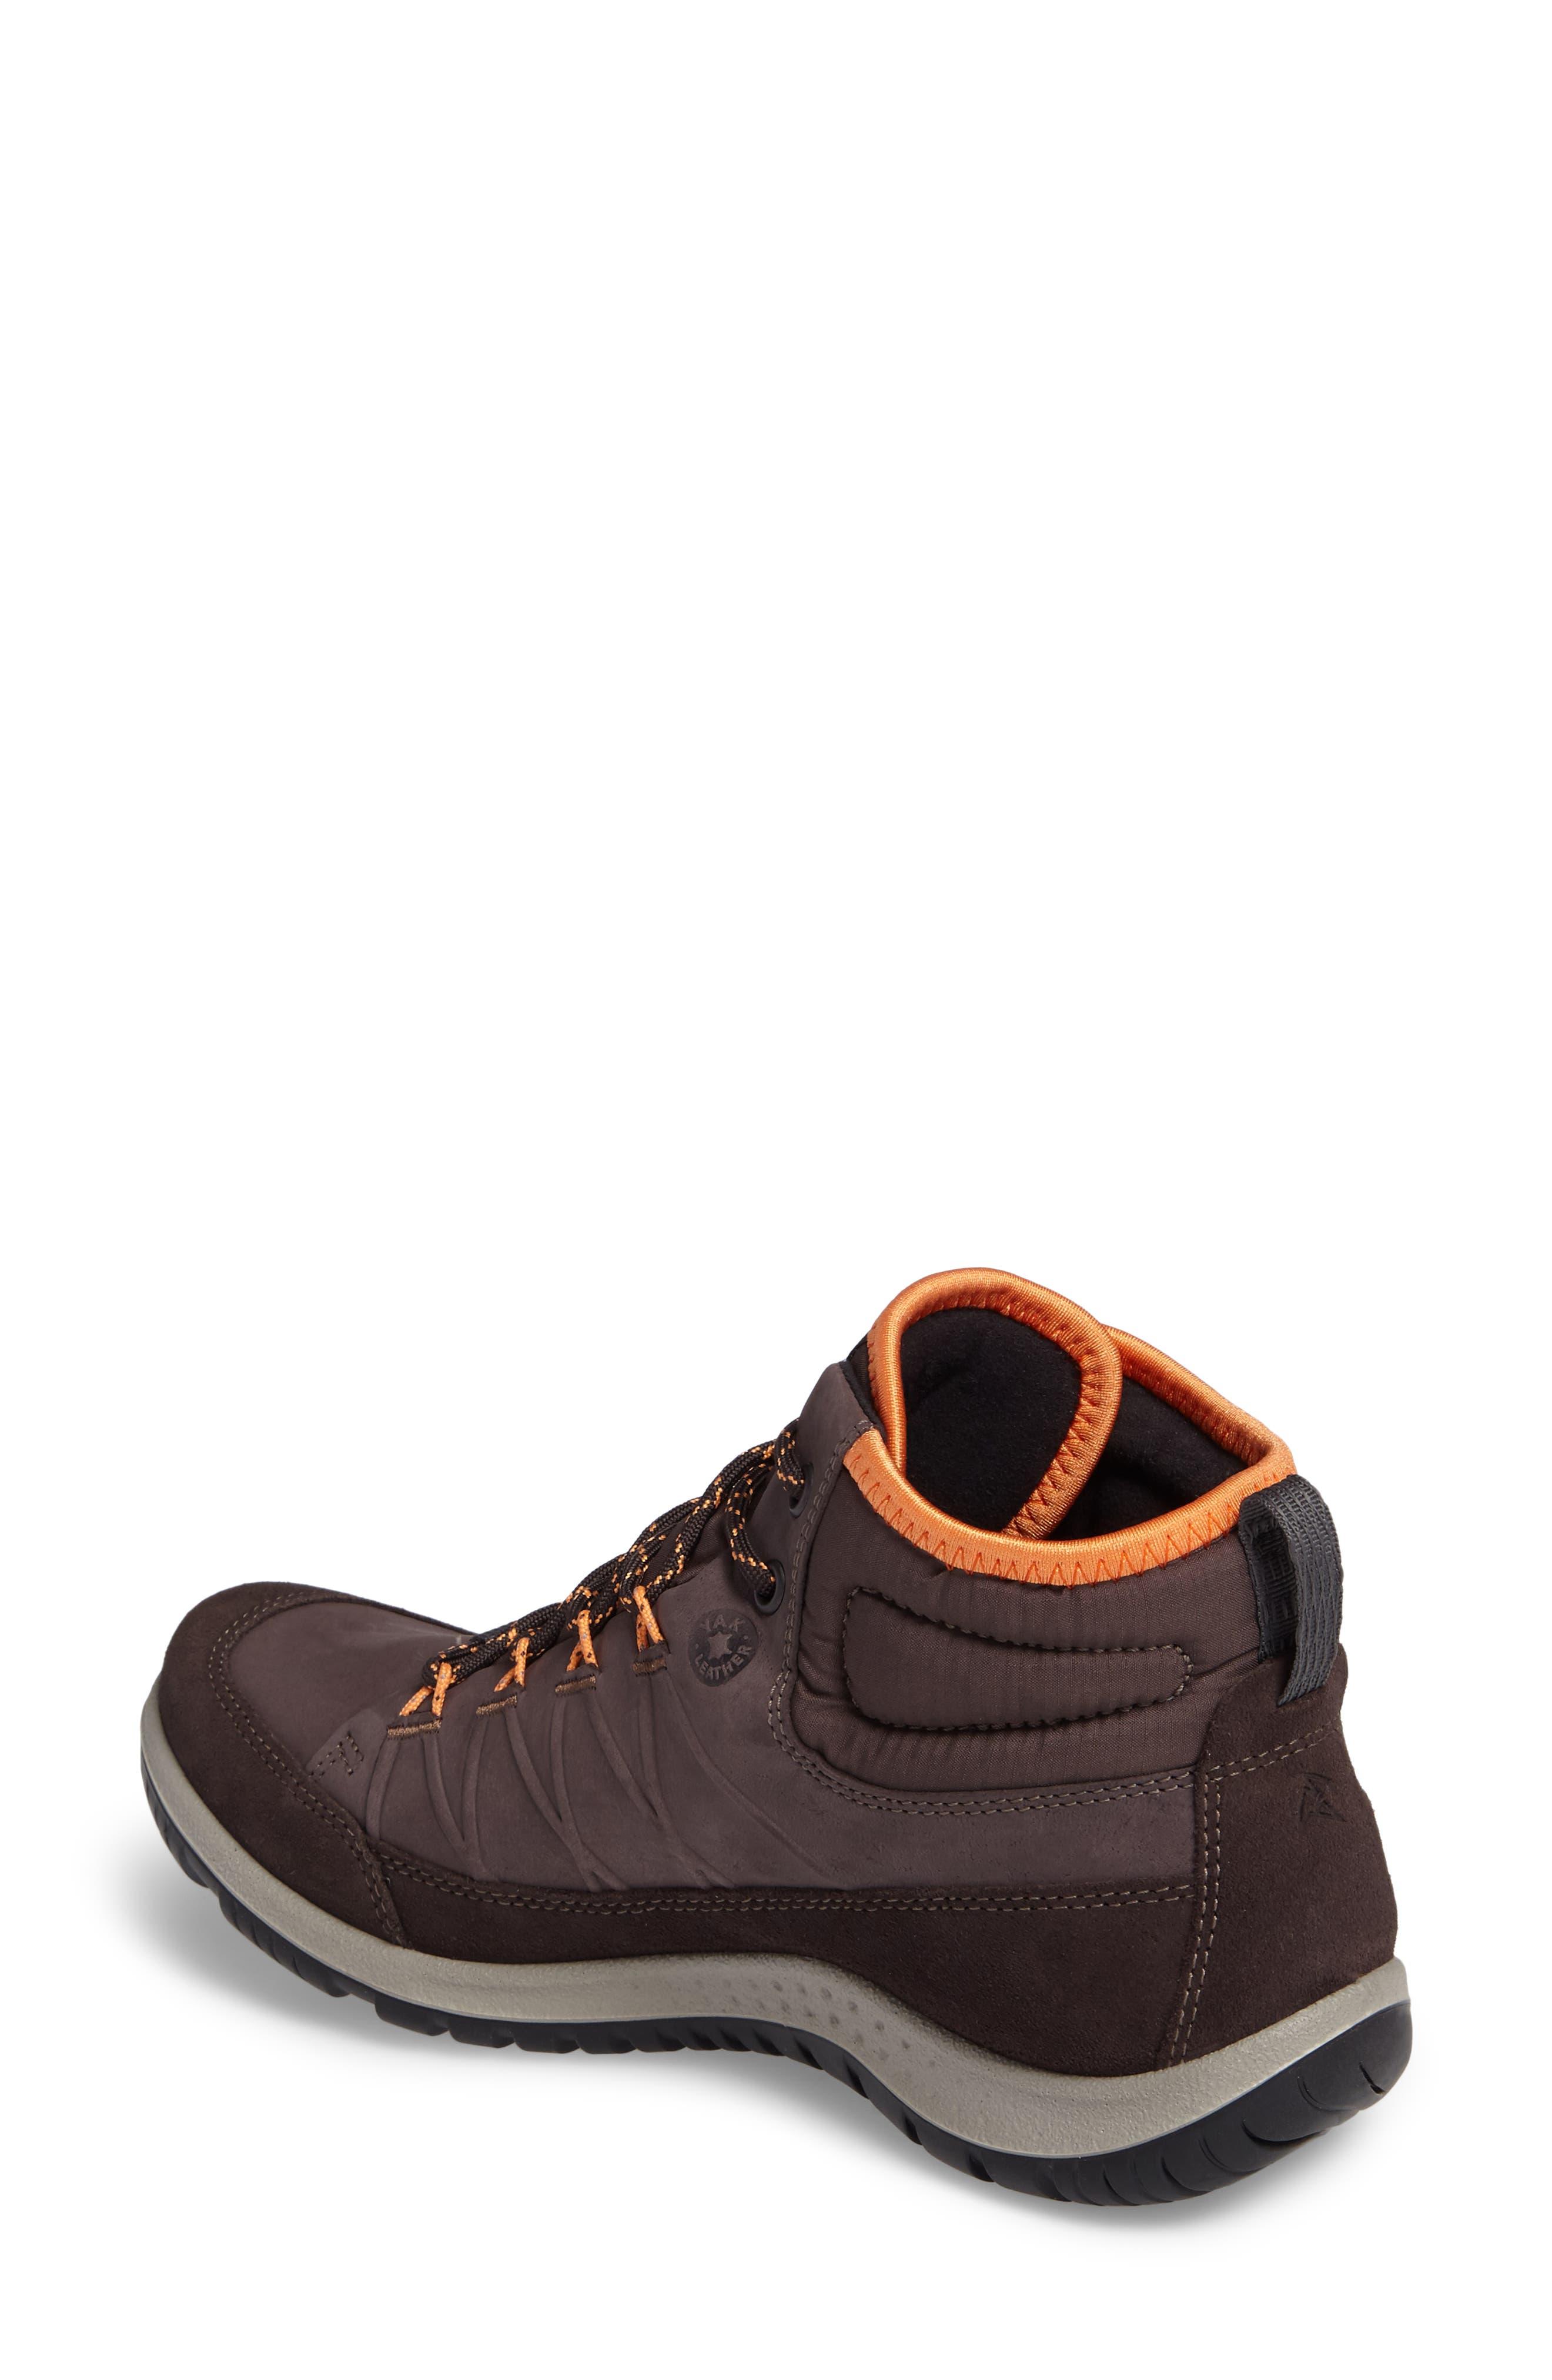 Alternate Image 2  - ECCO 'Aspina GTX' Waterproof High Top Sneaker (Women)